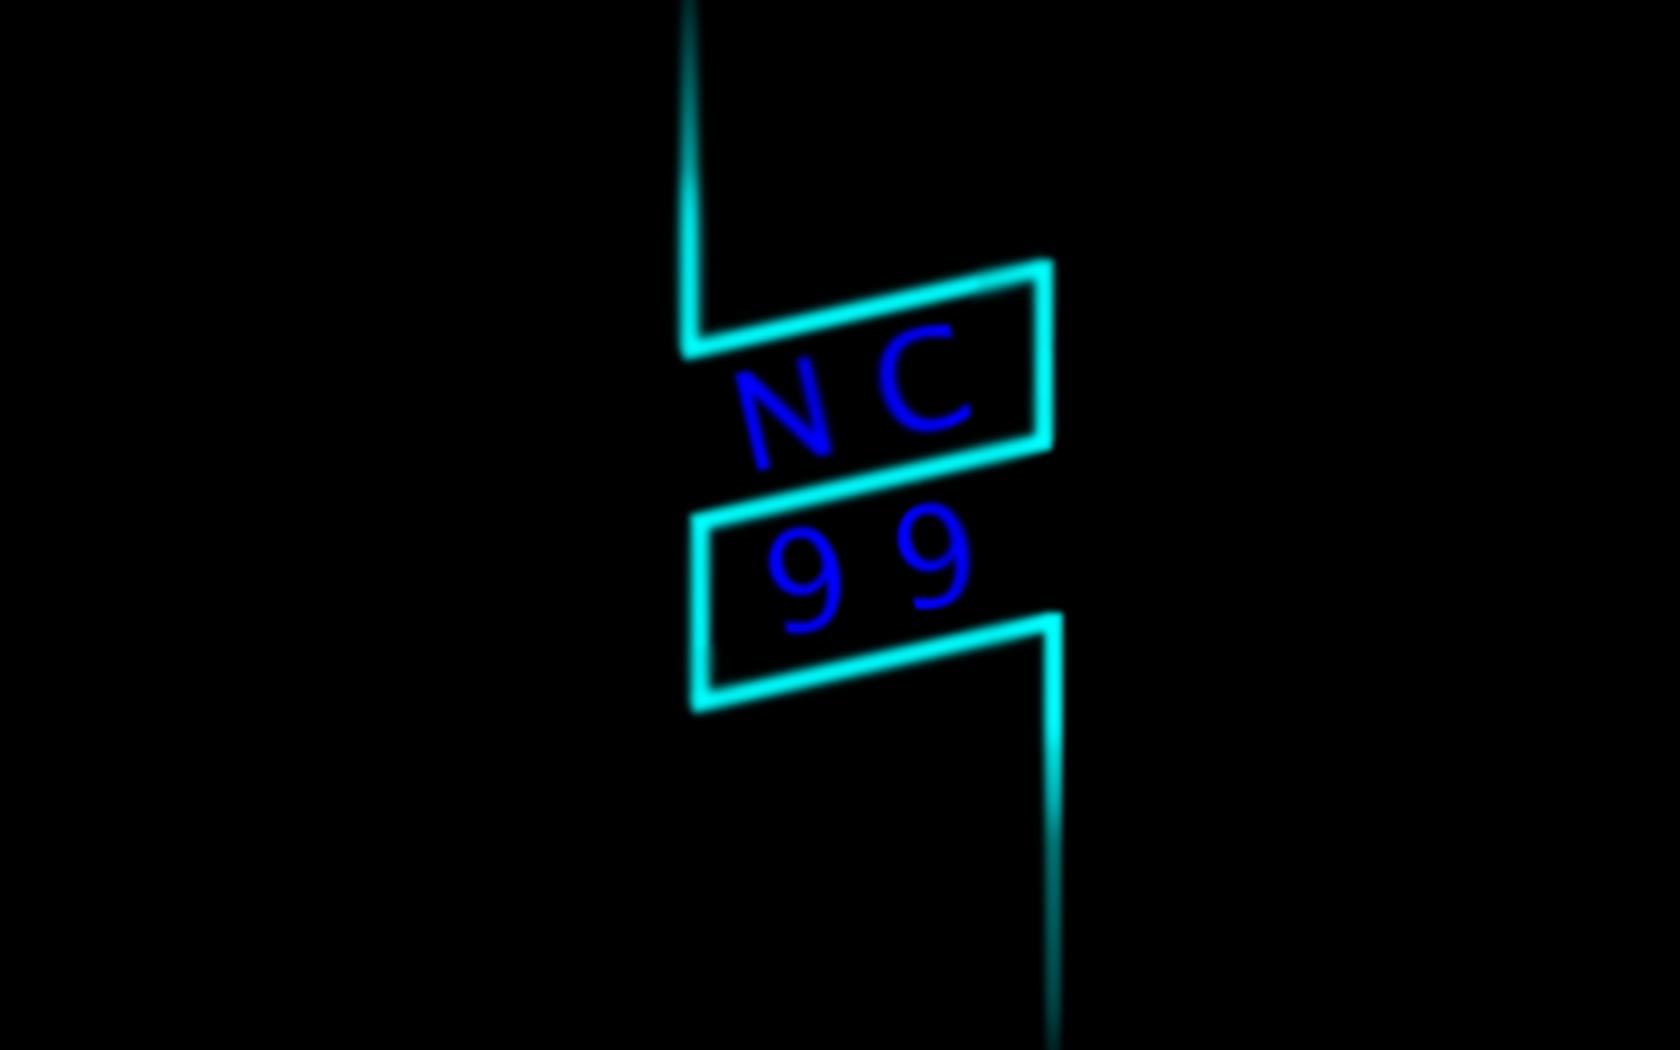 NC99 Symbol